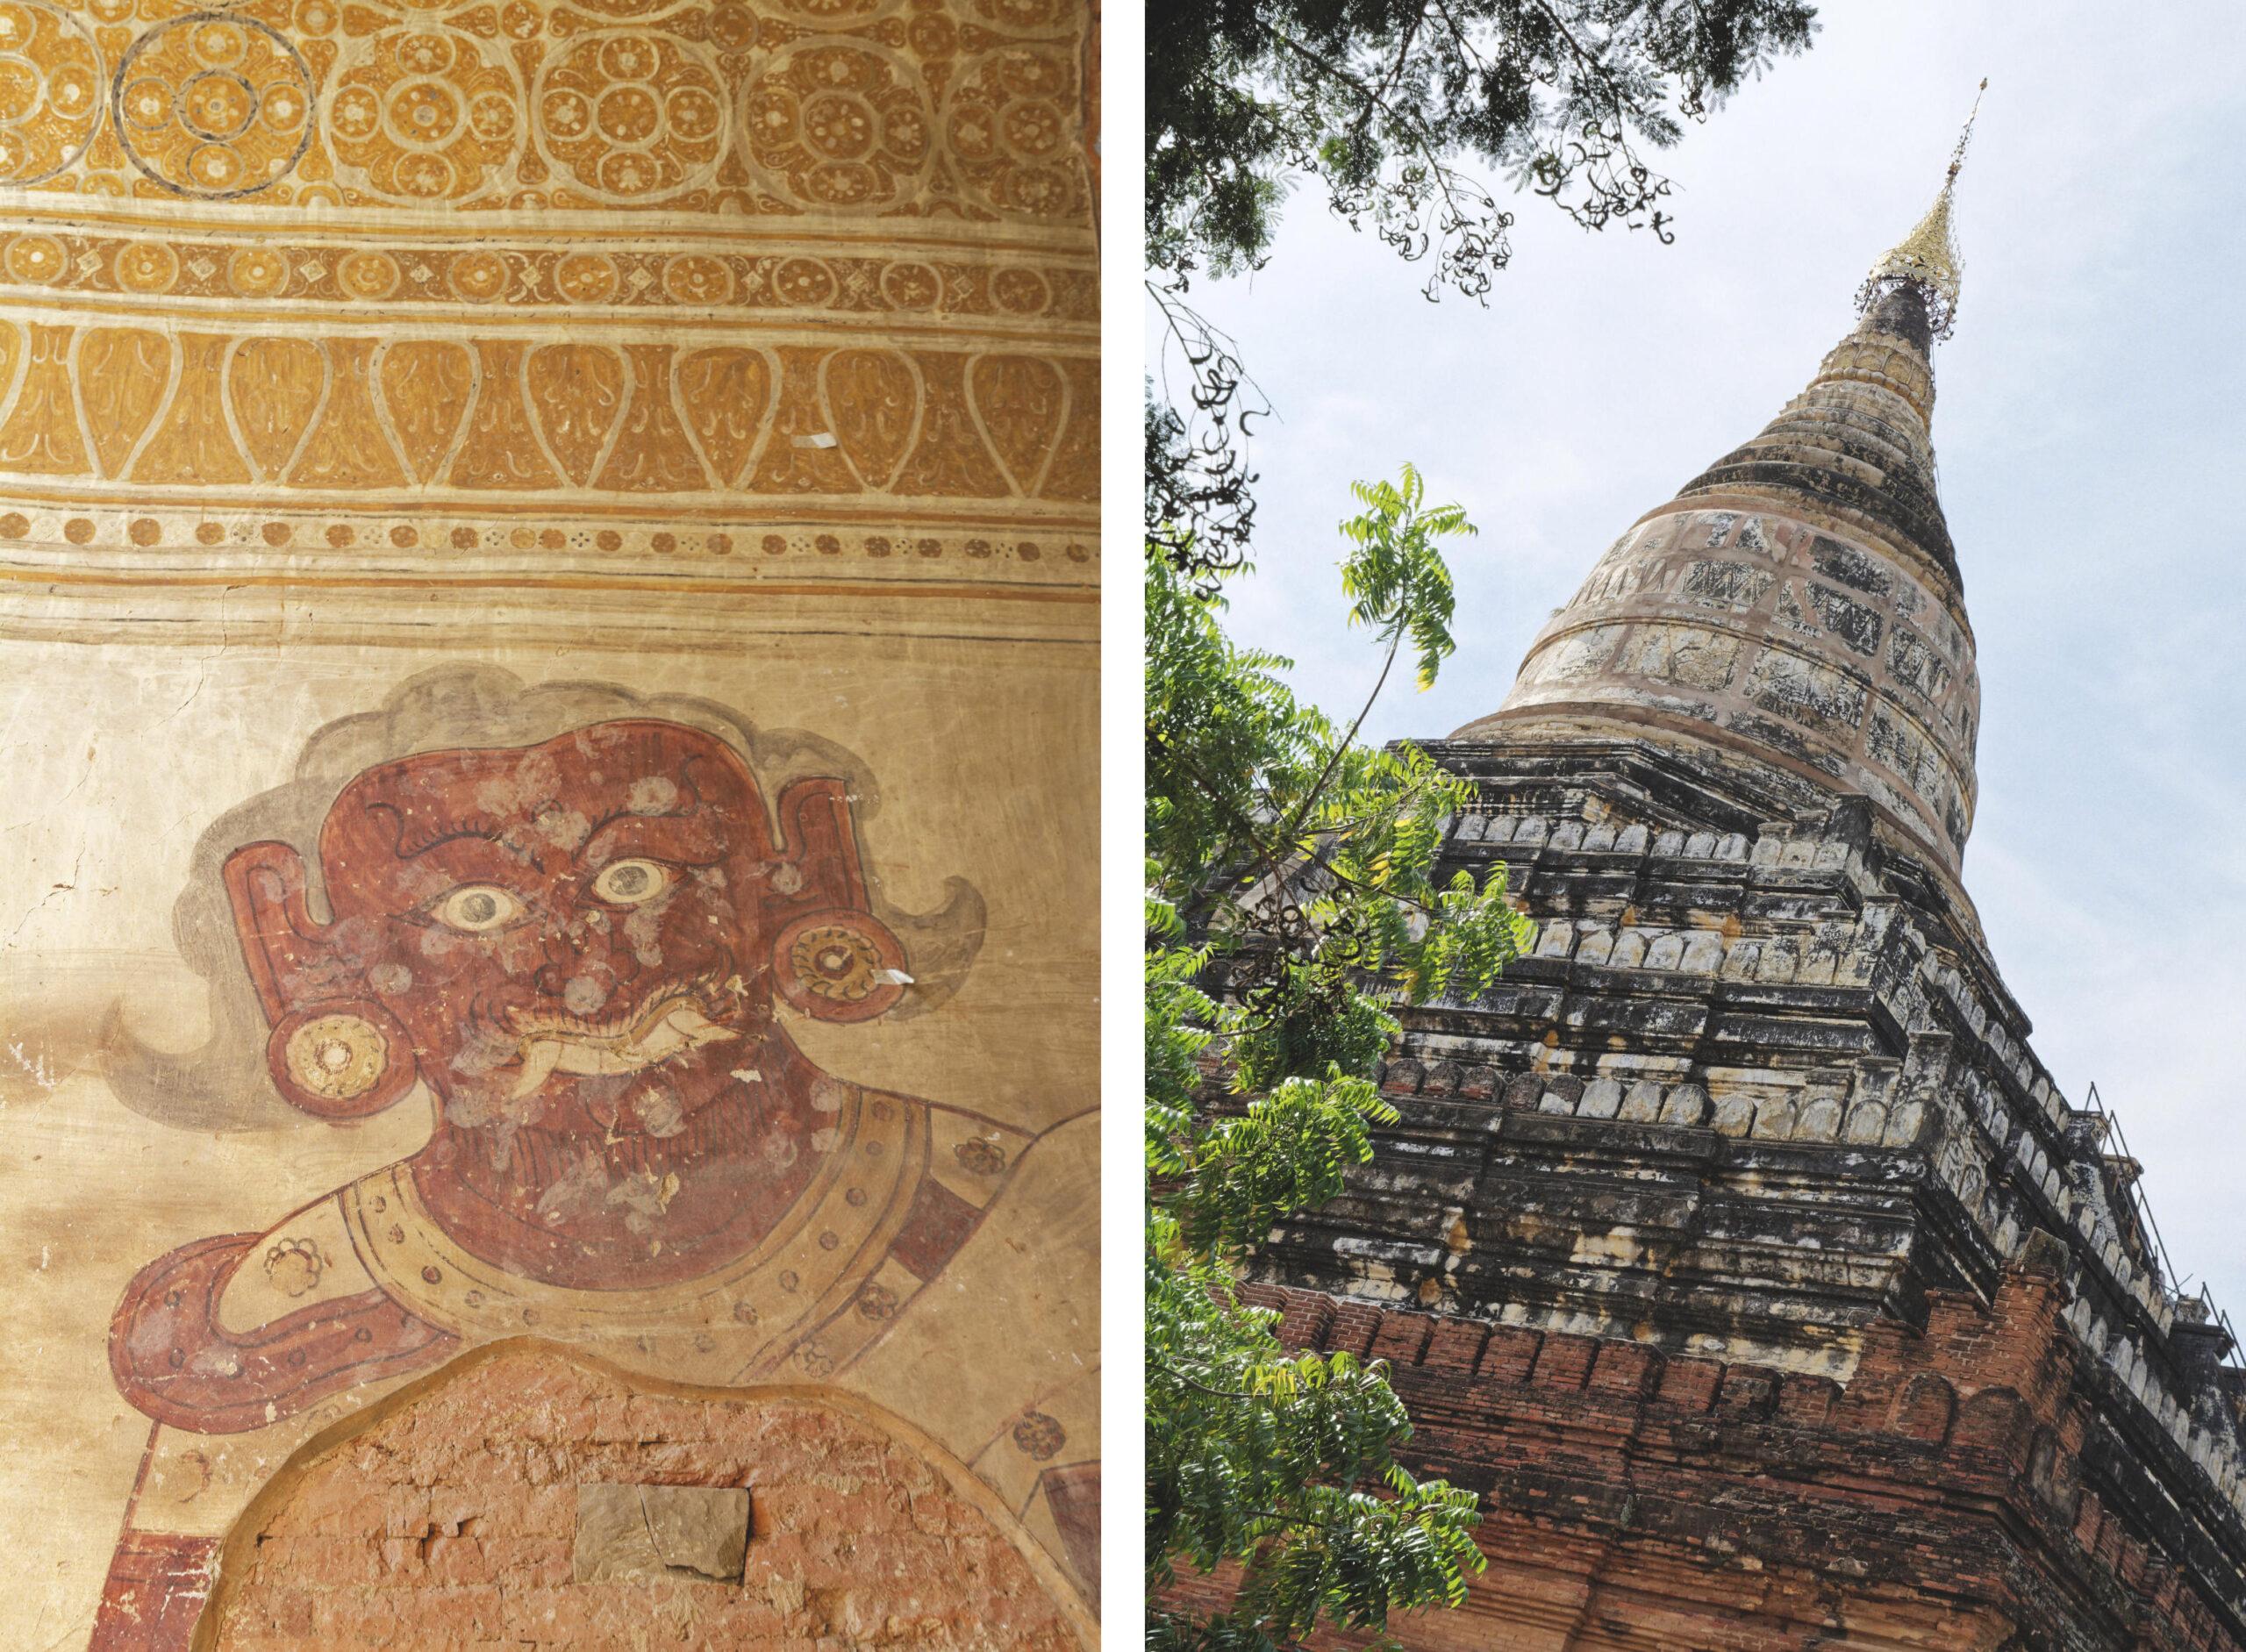 Peinture et pagode Bagan